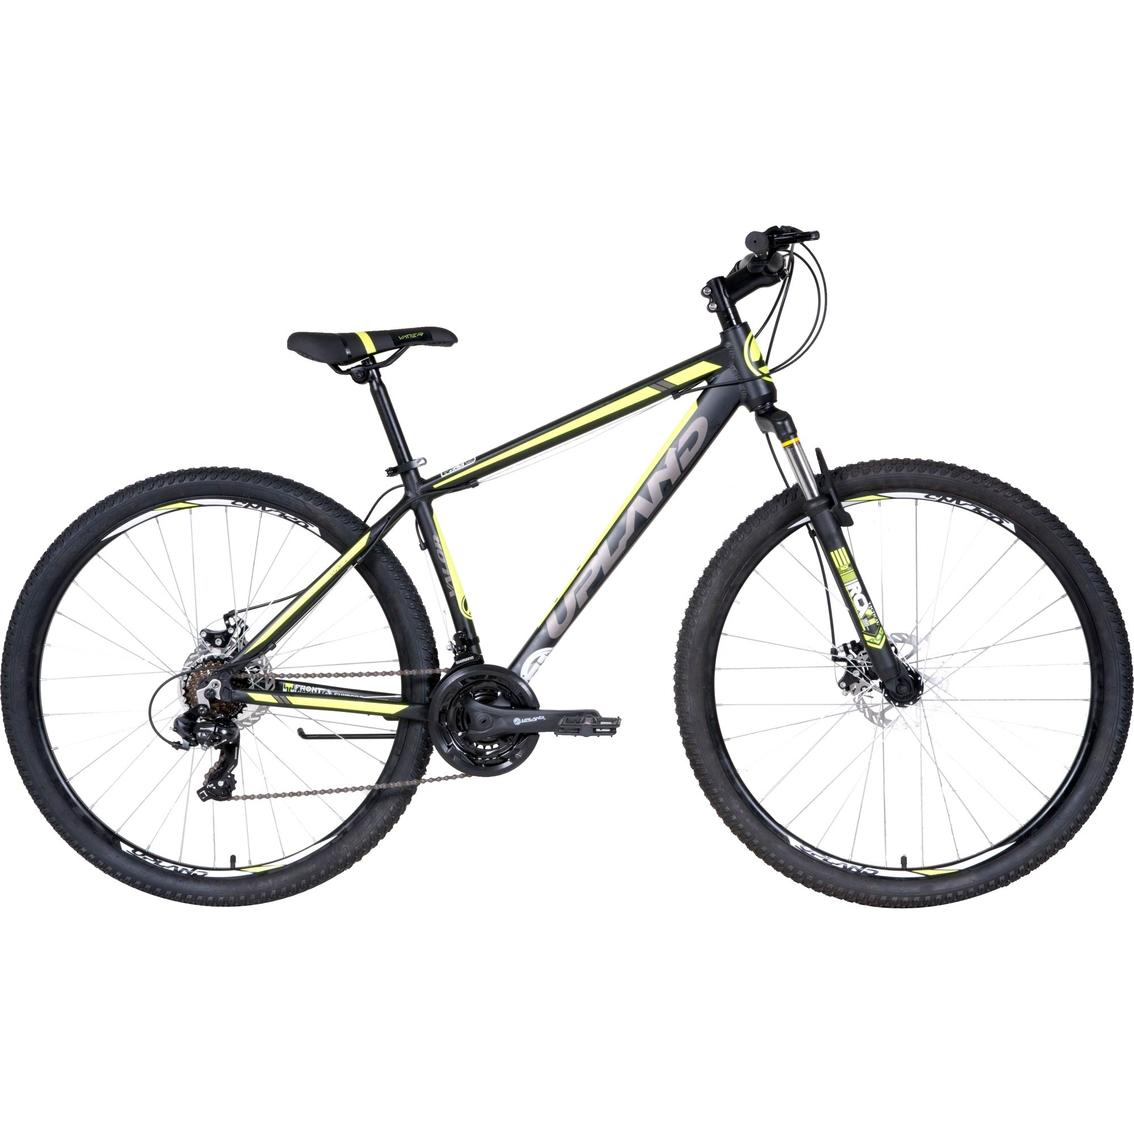 faf7e37bdea Upland Men's Valor 29 In. Mountain Bike | Adult Bikes | Sports ...